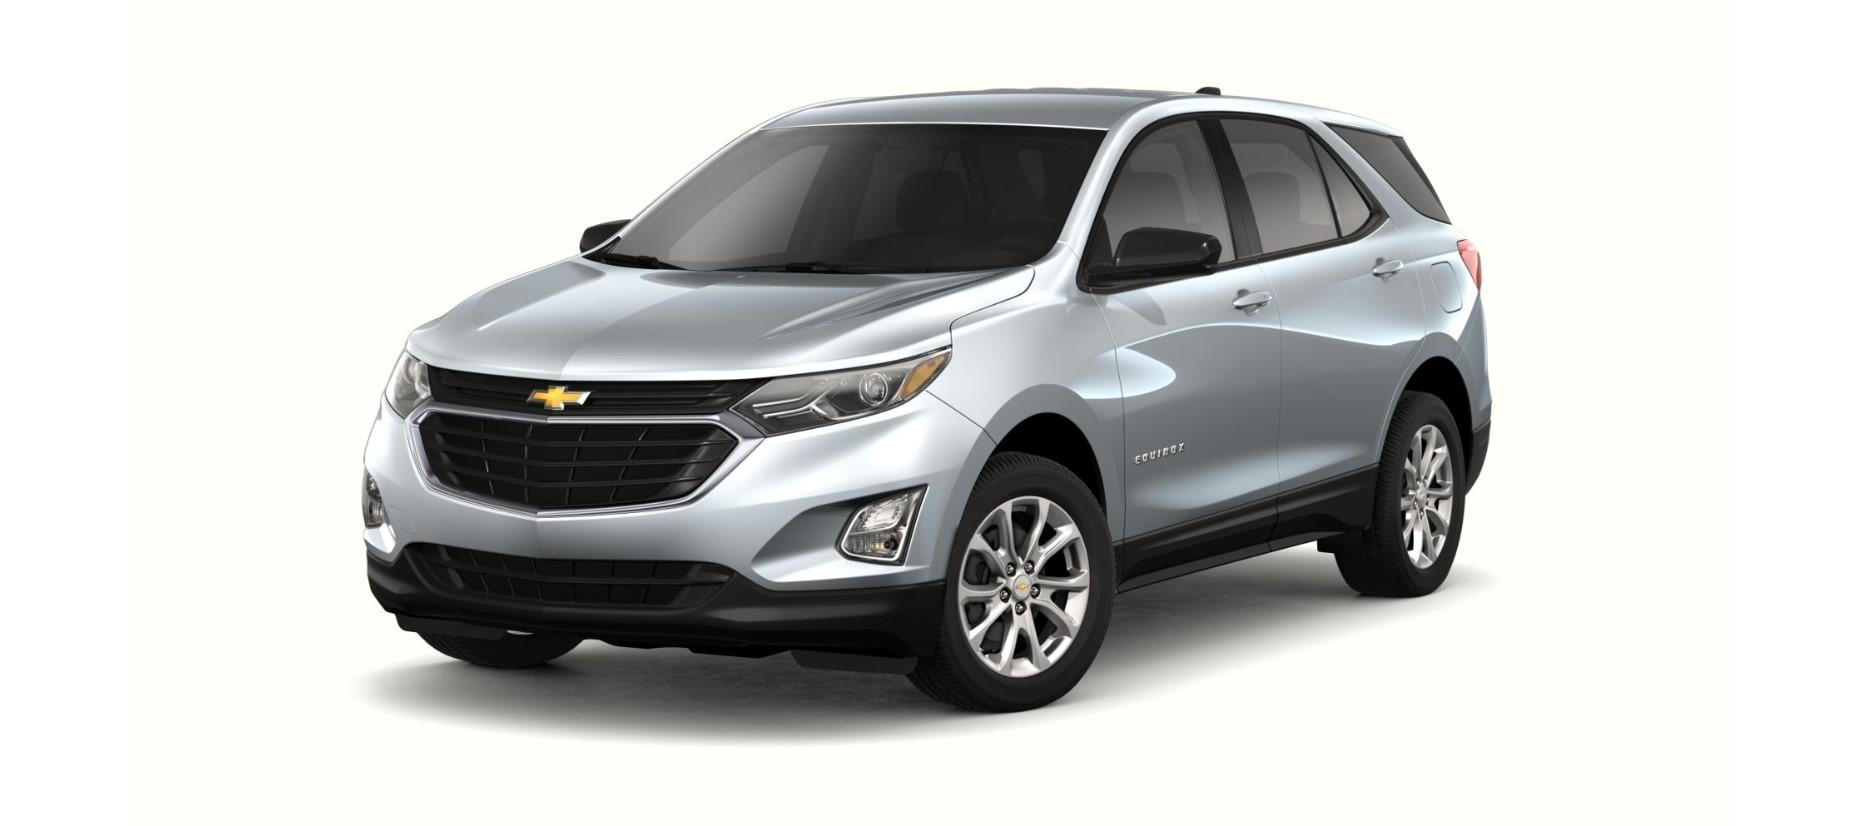 Kelebihan Chevrolet Ls Top Model Tahun Ini